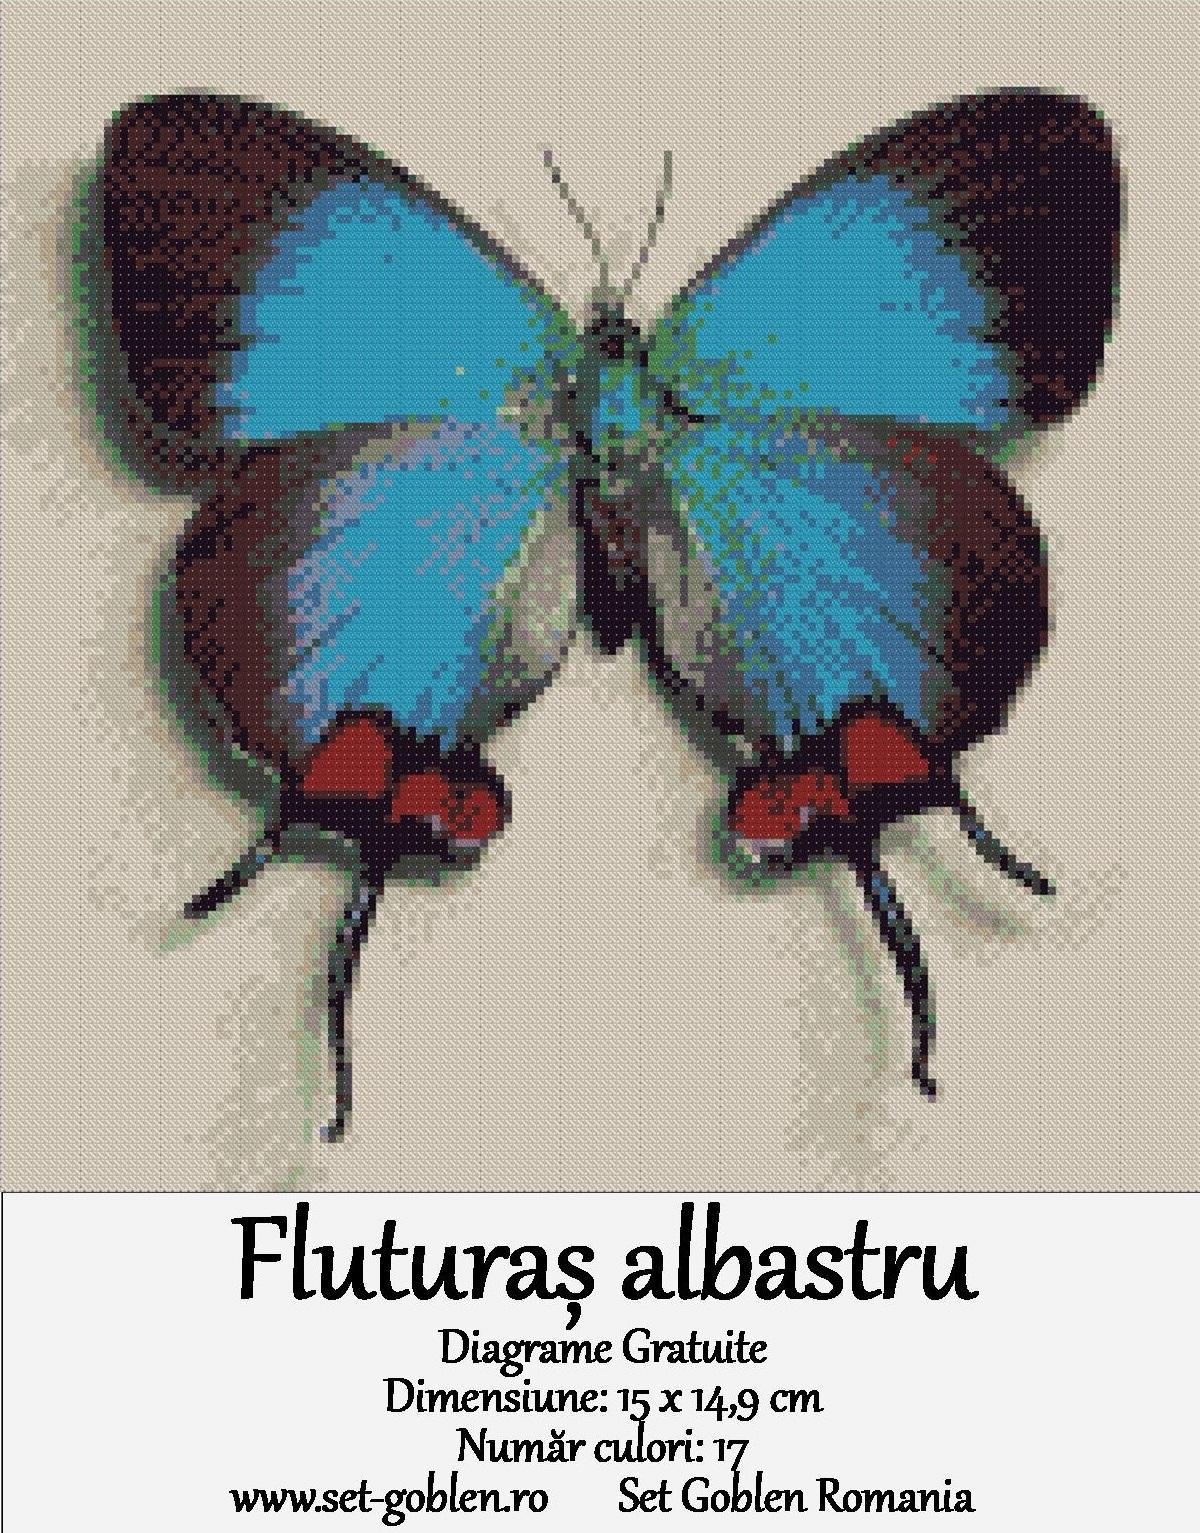 Goblen cu diagrame gratuite – Fluturaș albastru